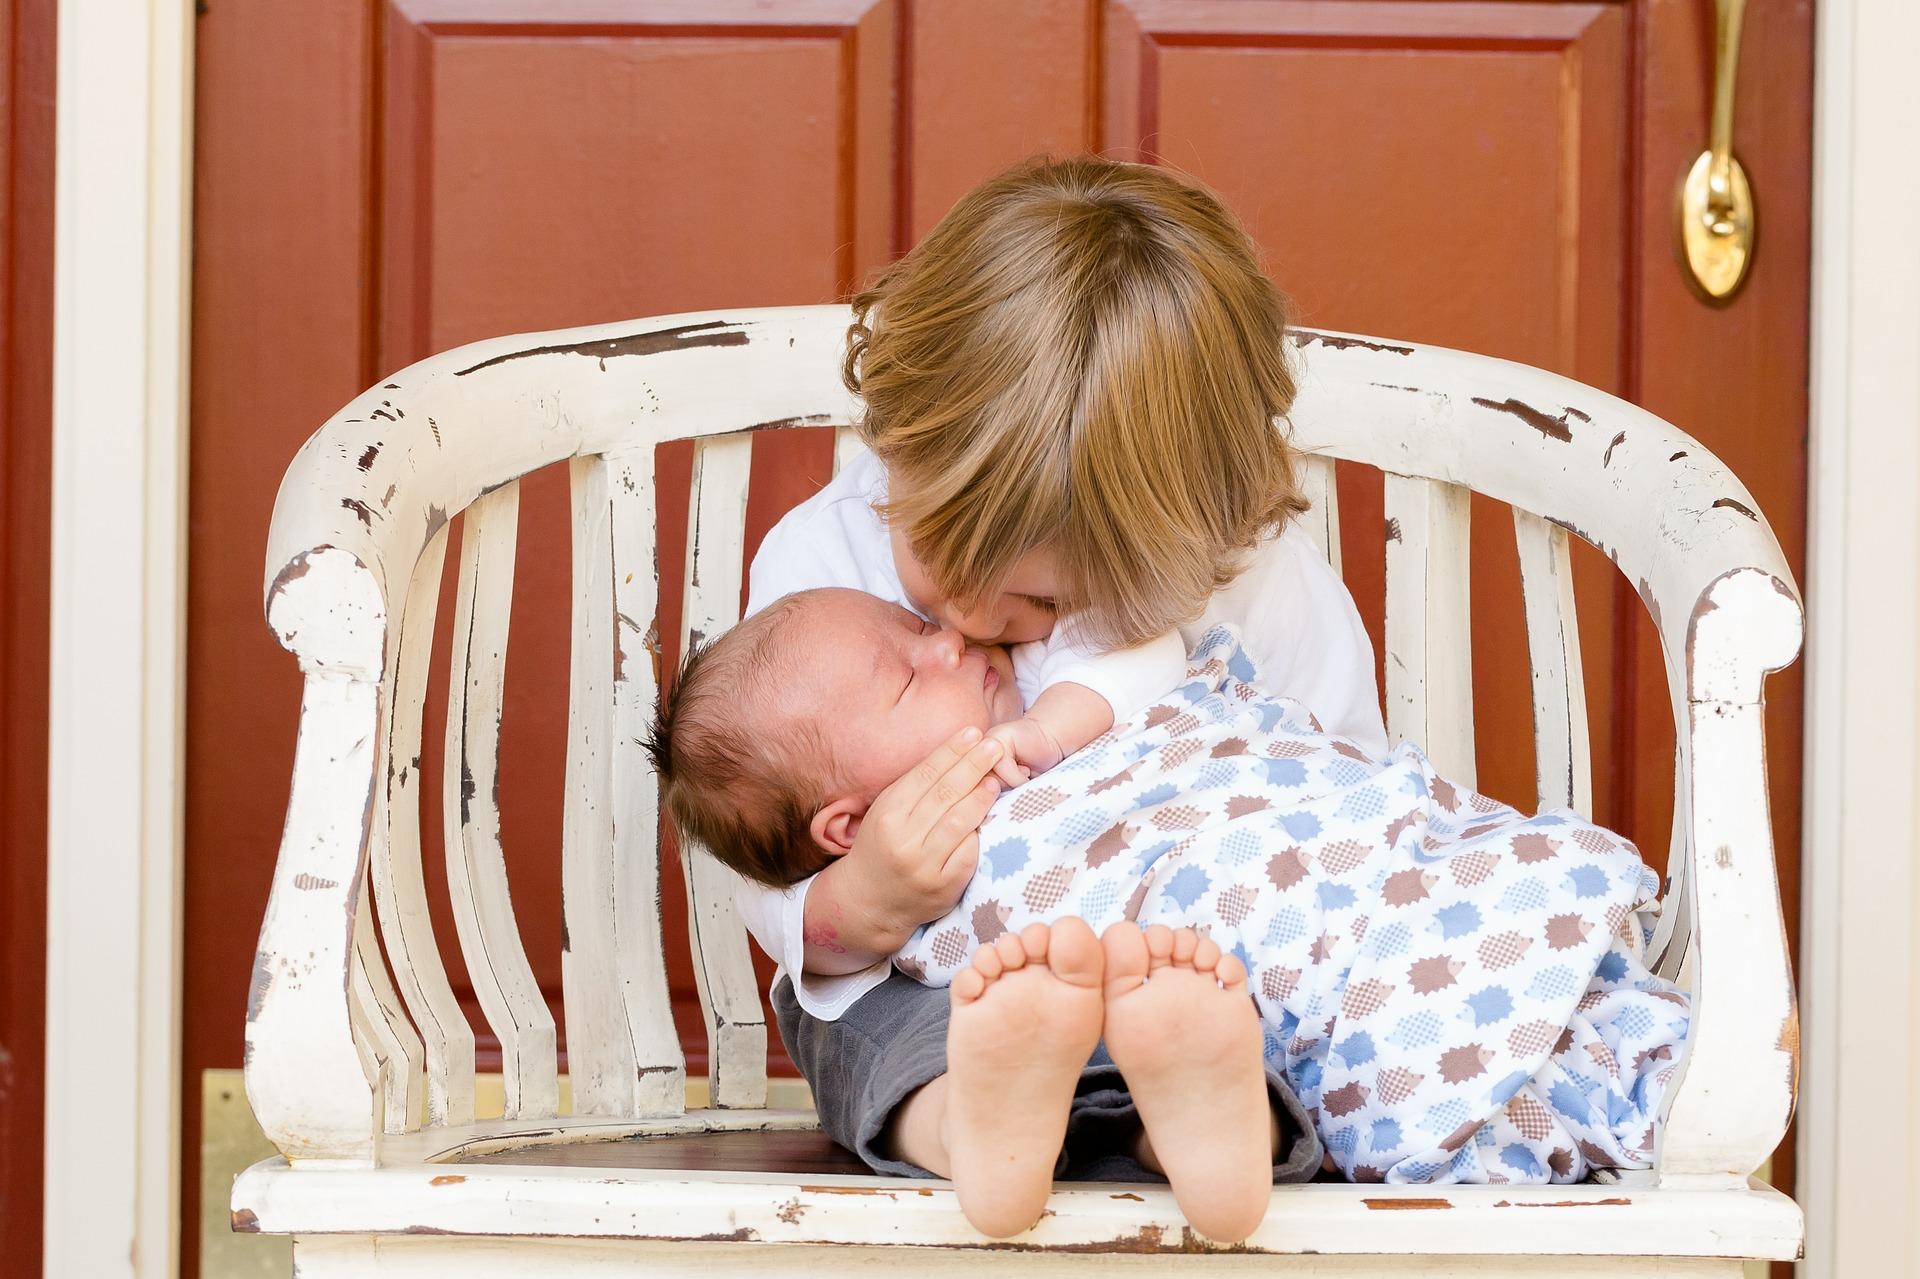 Siblings Sitting in Chair (Family)